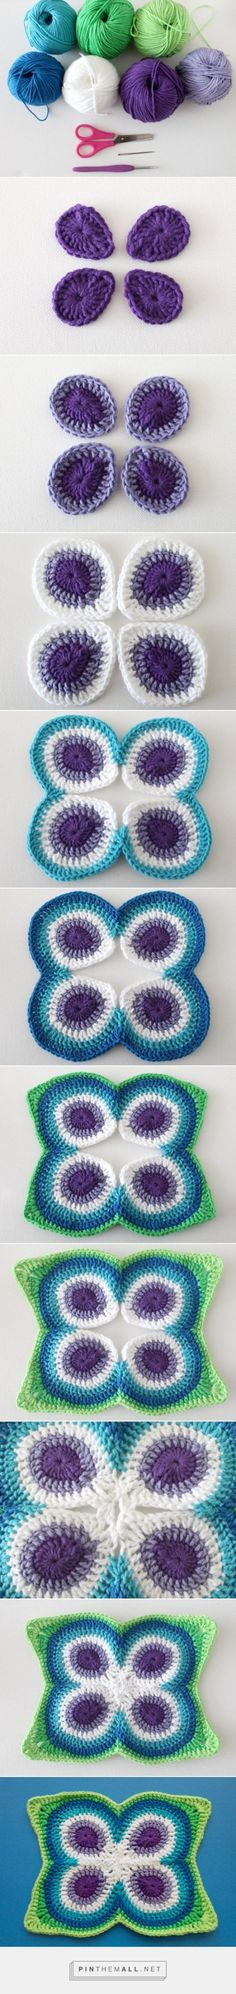 Jessica | Crochet Designs: Peacock Crochet Blanket Pattern Is A Favourite